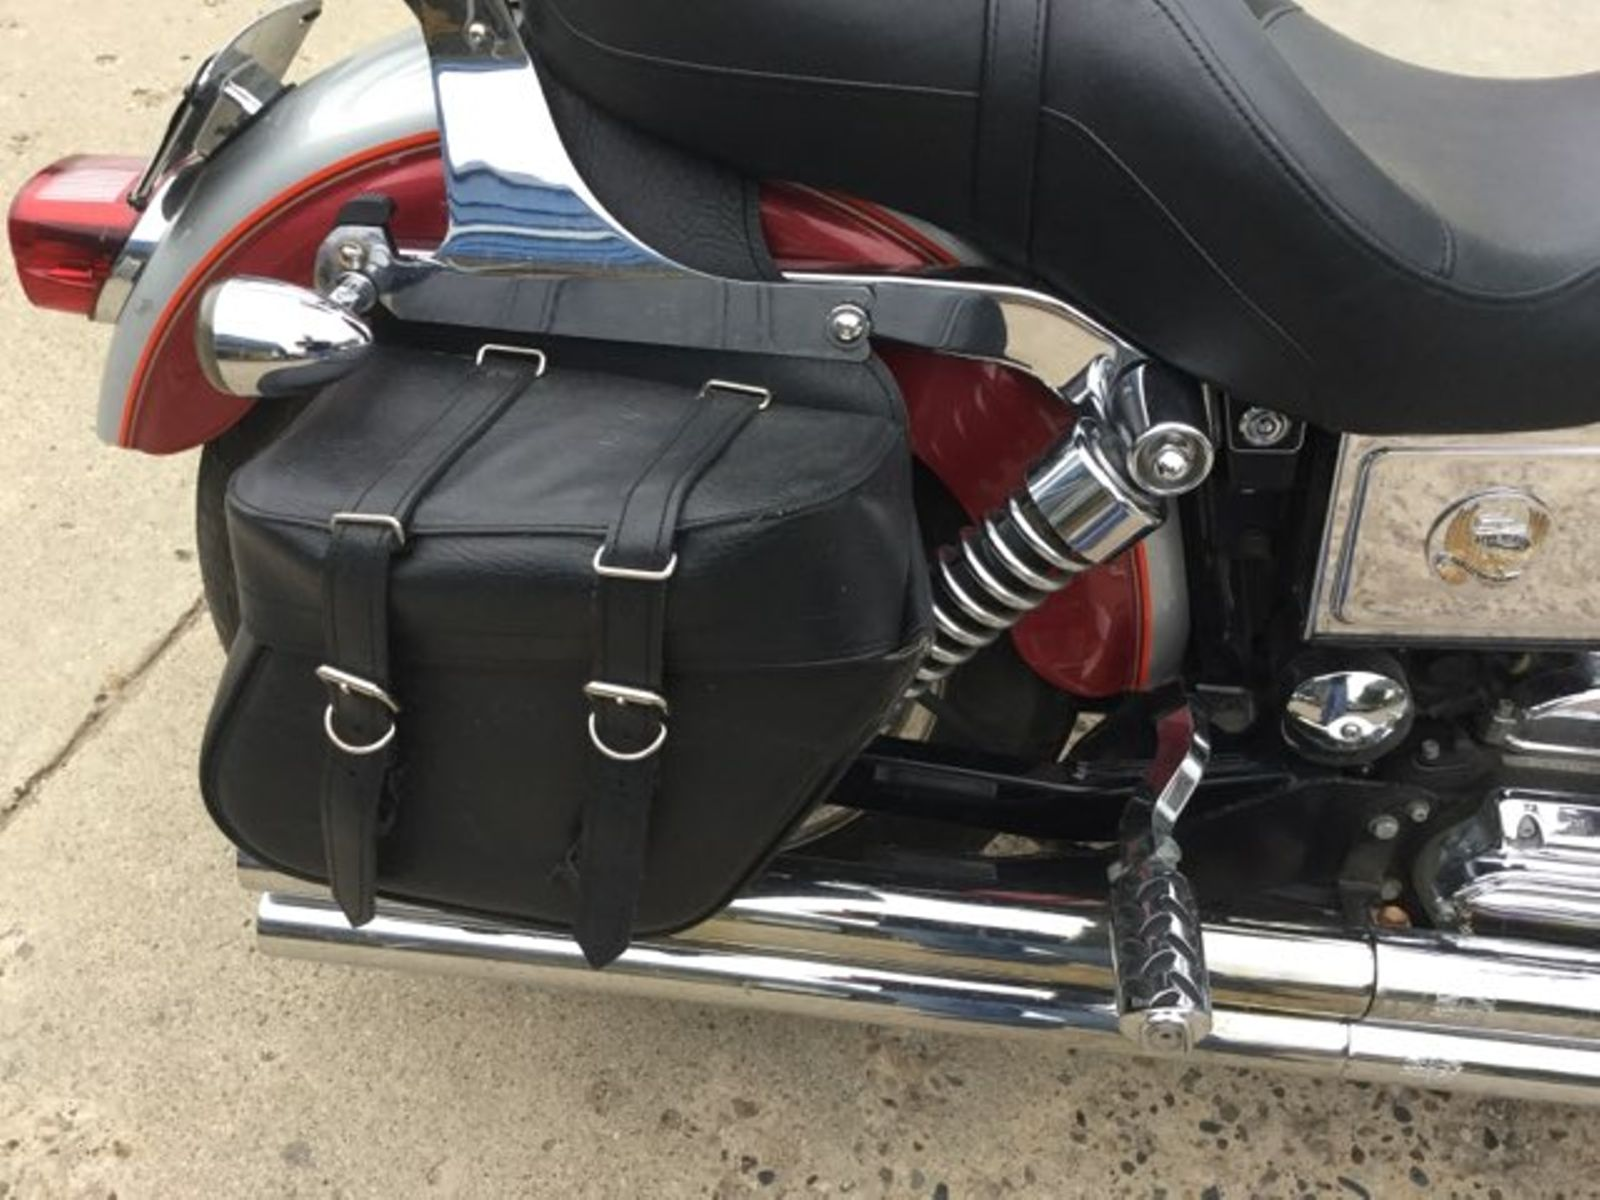 ... 2004 Harley-Davidson Dyna Glide Low Rider city MN Elite Motors LLC in Lake Crystal